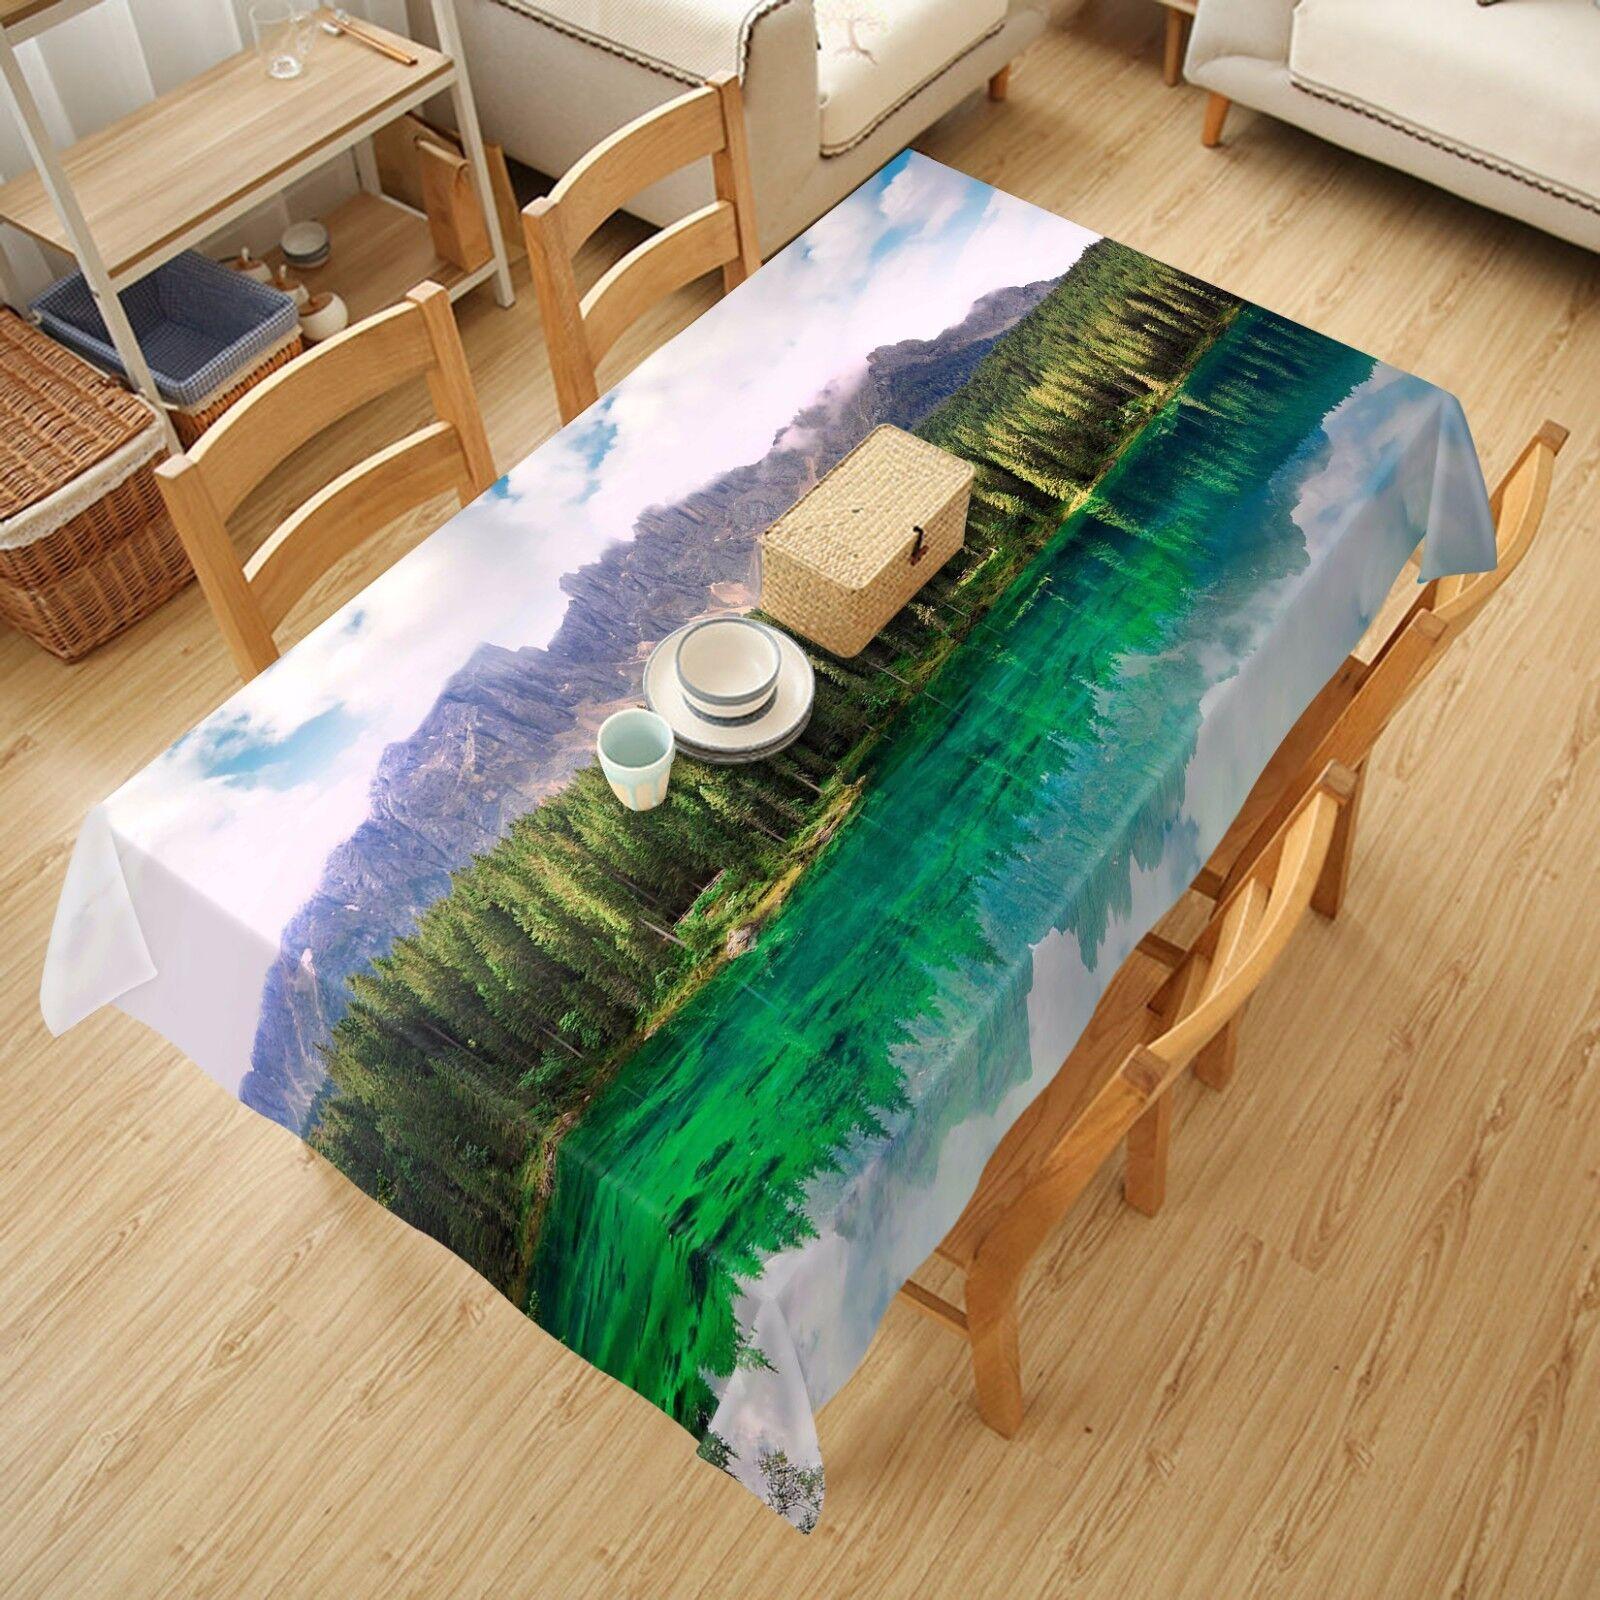 3D Trees Tablecloth Table Cover Cloth Birthday Party AJ WALLPAPER UK Lemon